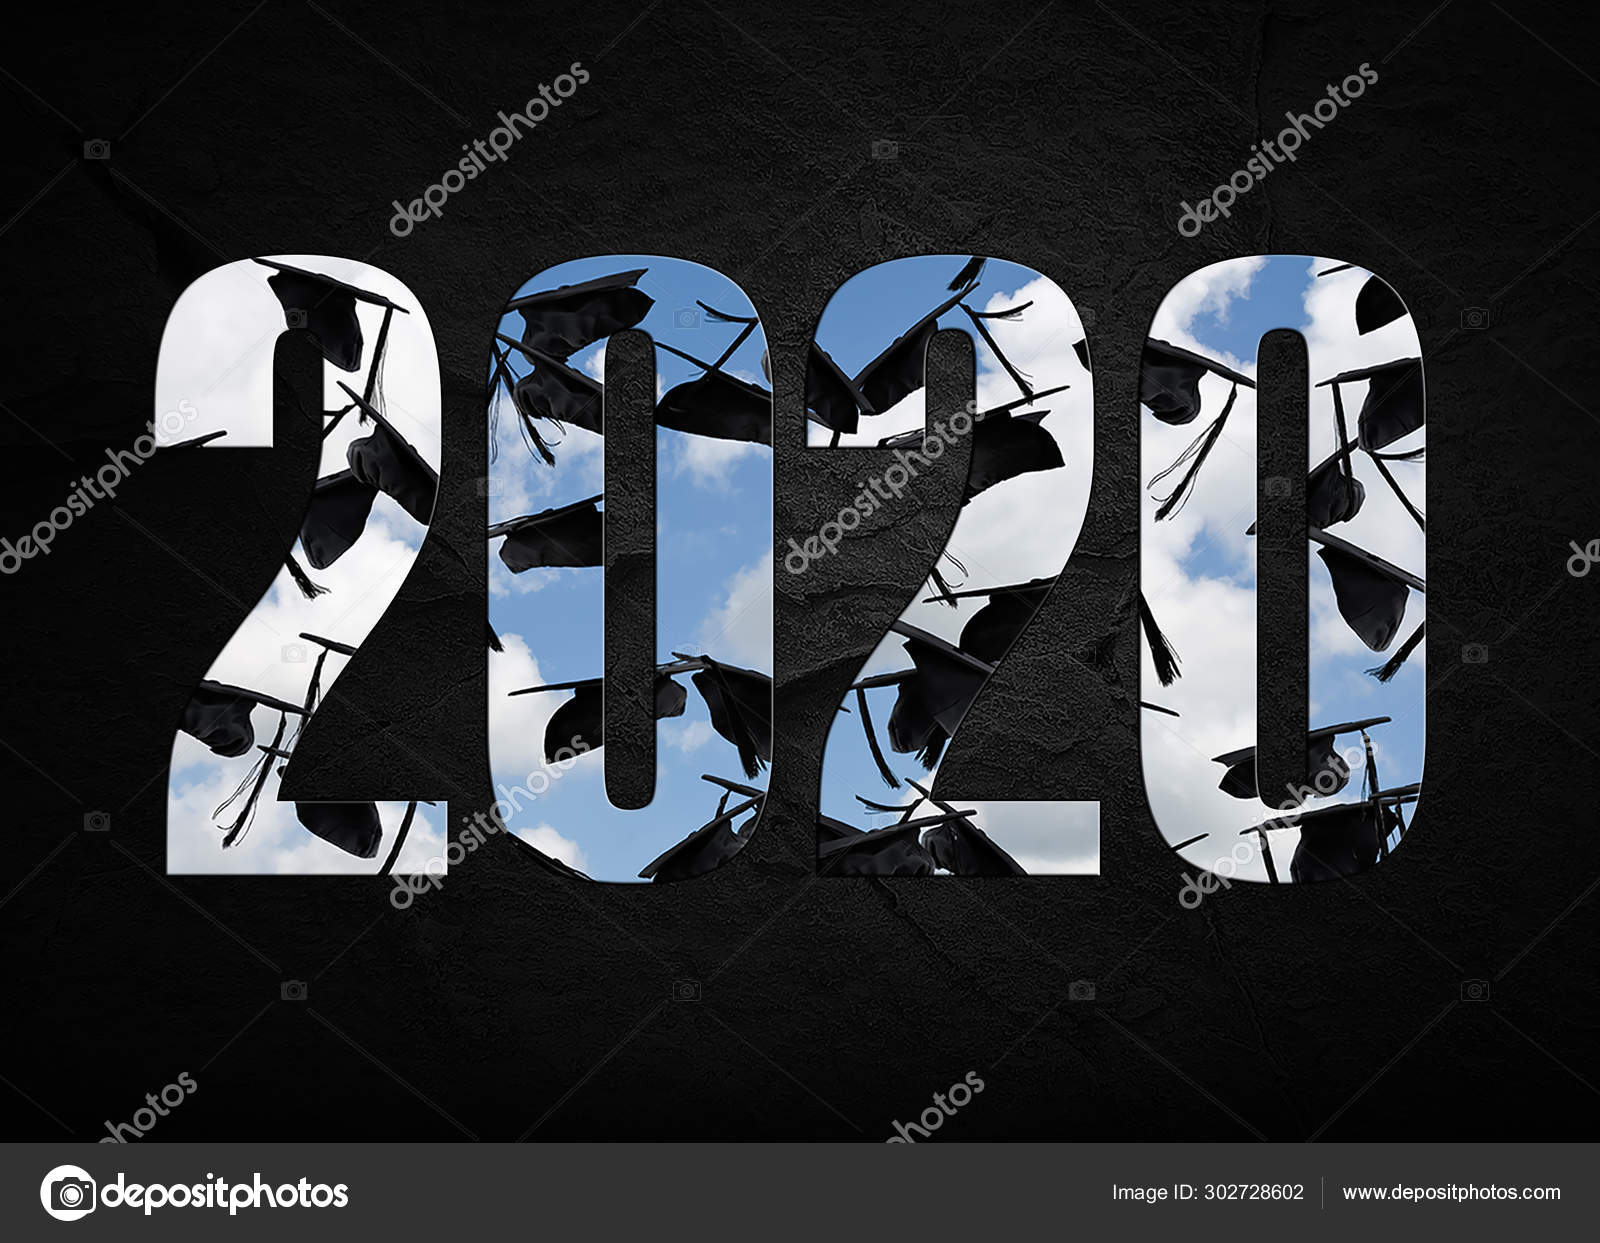 Graduation Background 2020.Bold Text Black Graduation Caps Sky Class 2020 Textured Rock